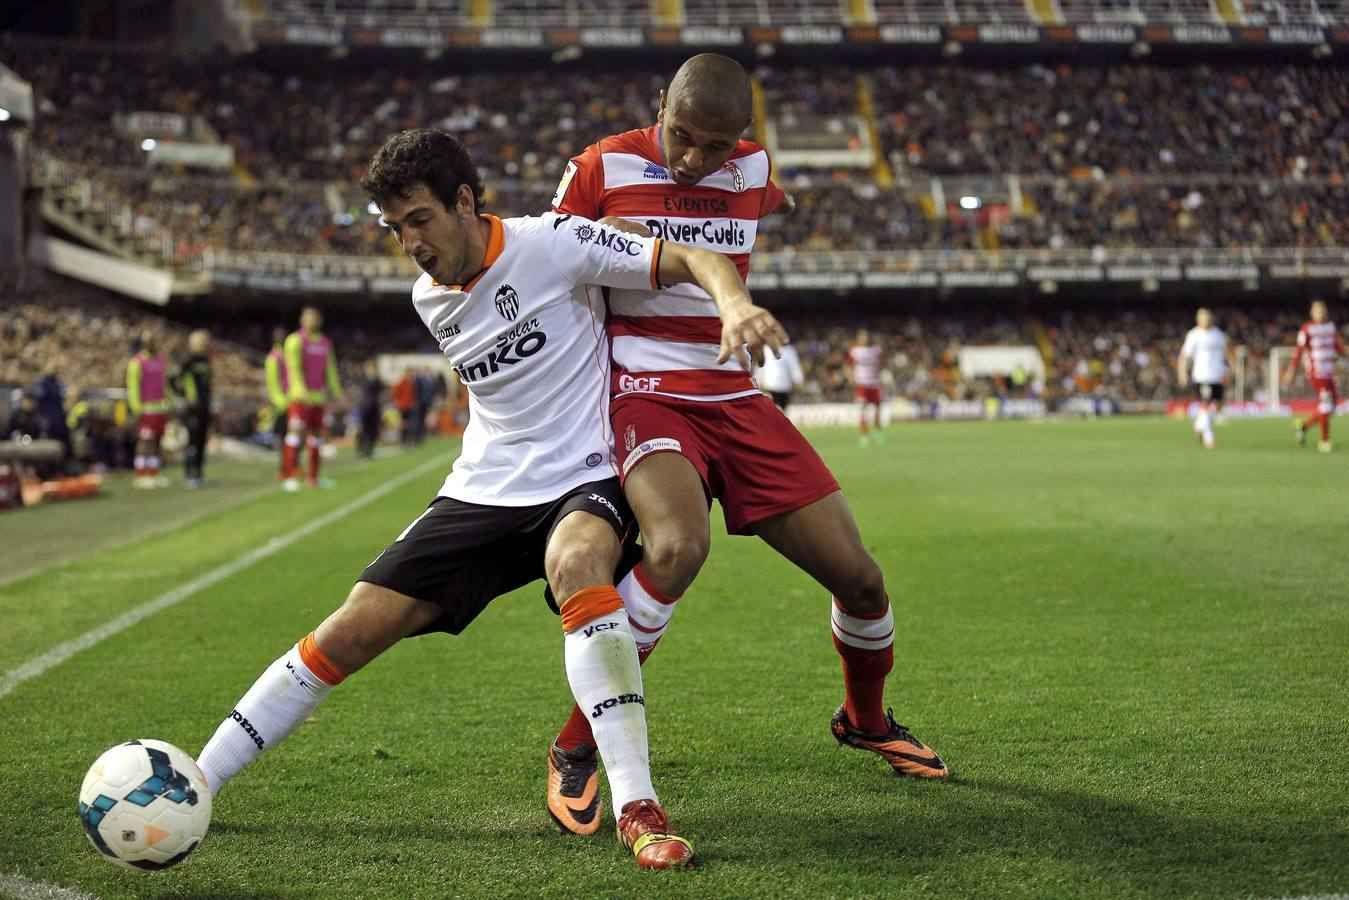 23.02.2014: Valencia CF 2 - 1 Granada CF